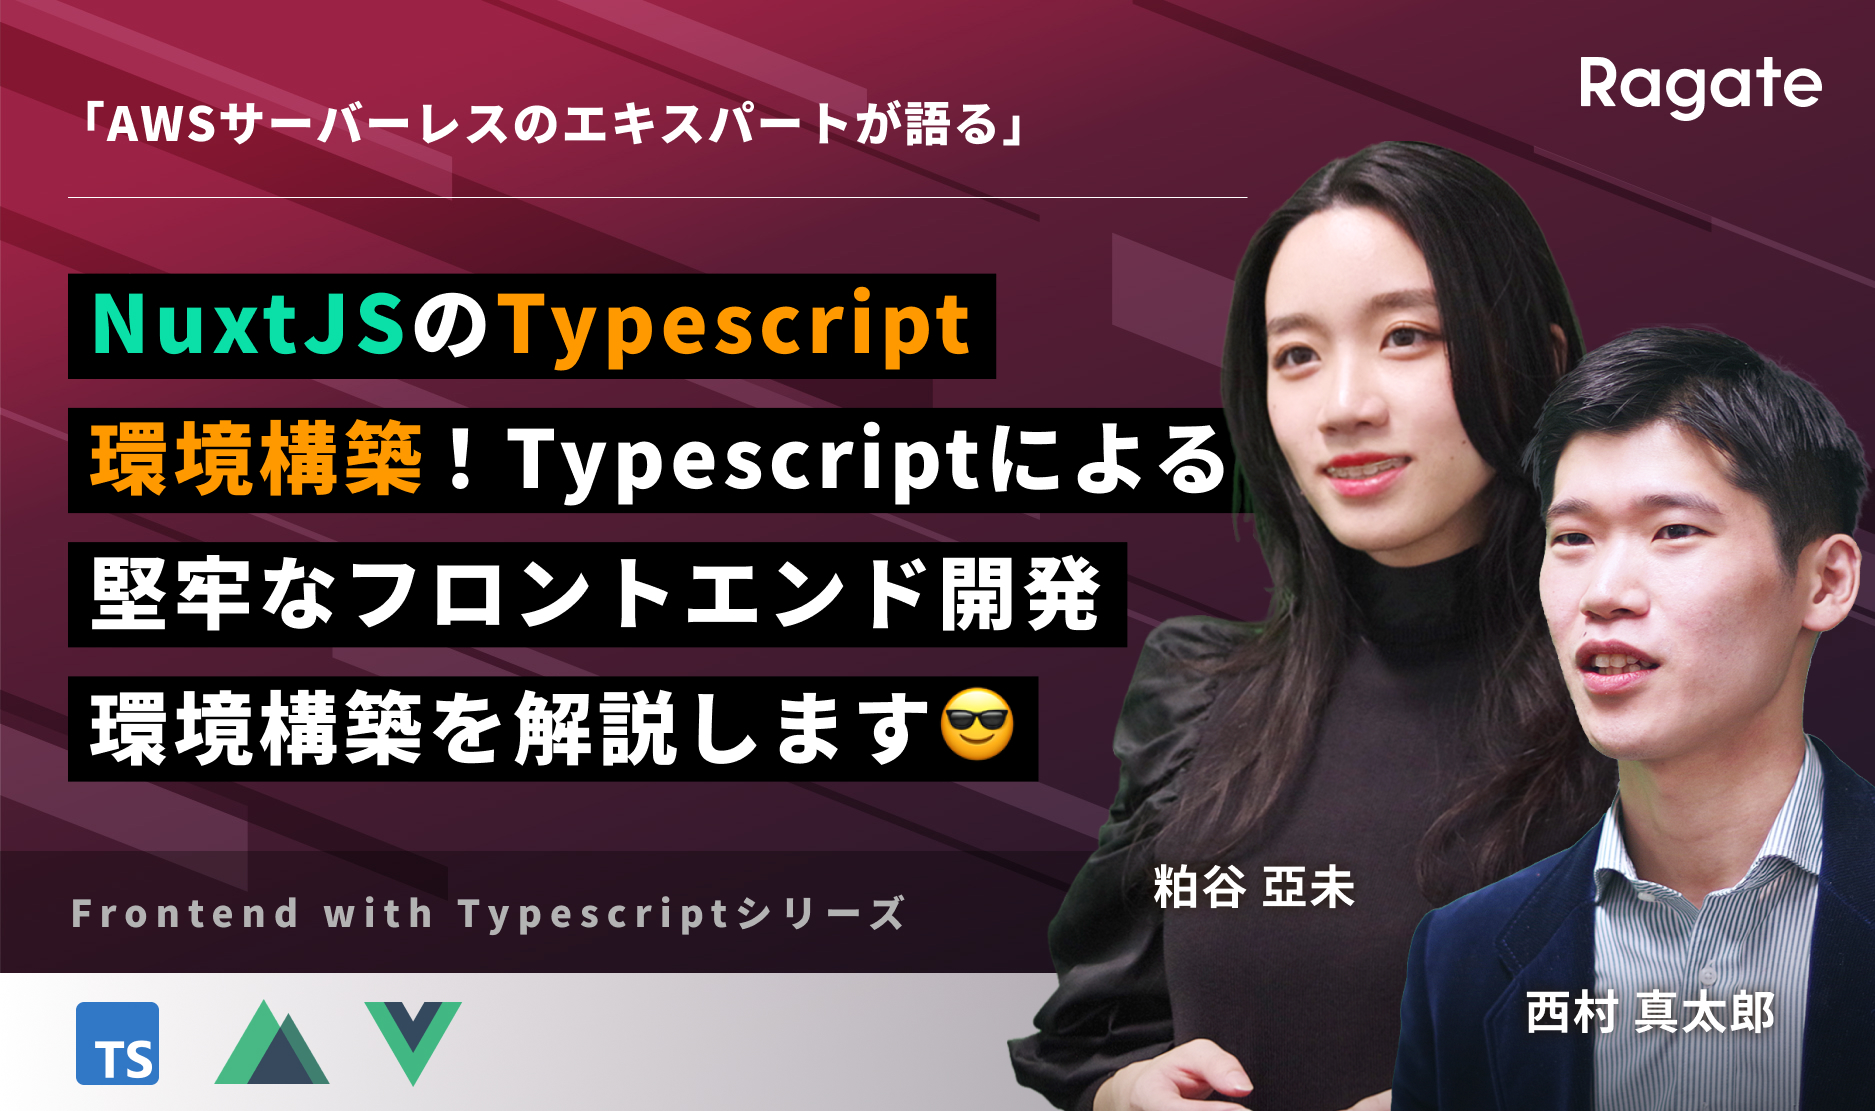 NuxtJSのTypescript環境構築!Typescriptによる堅牢なフロントエンド開発環境構築を解説します😎